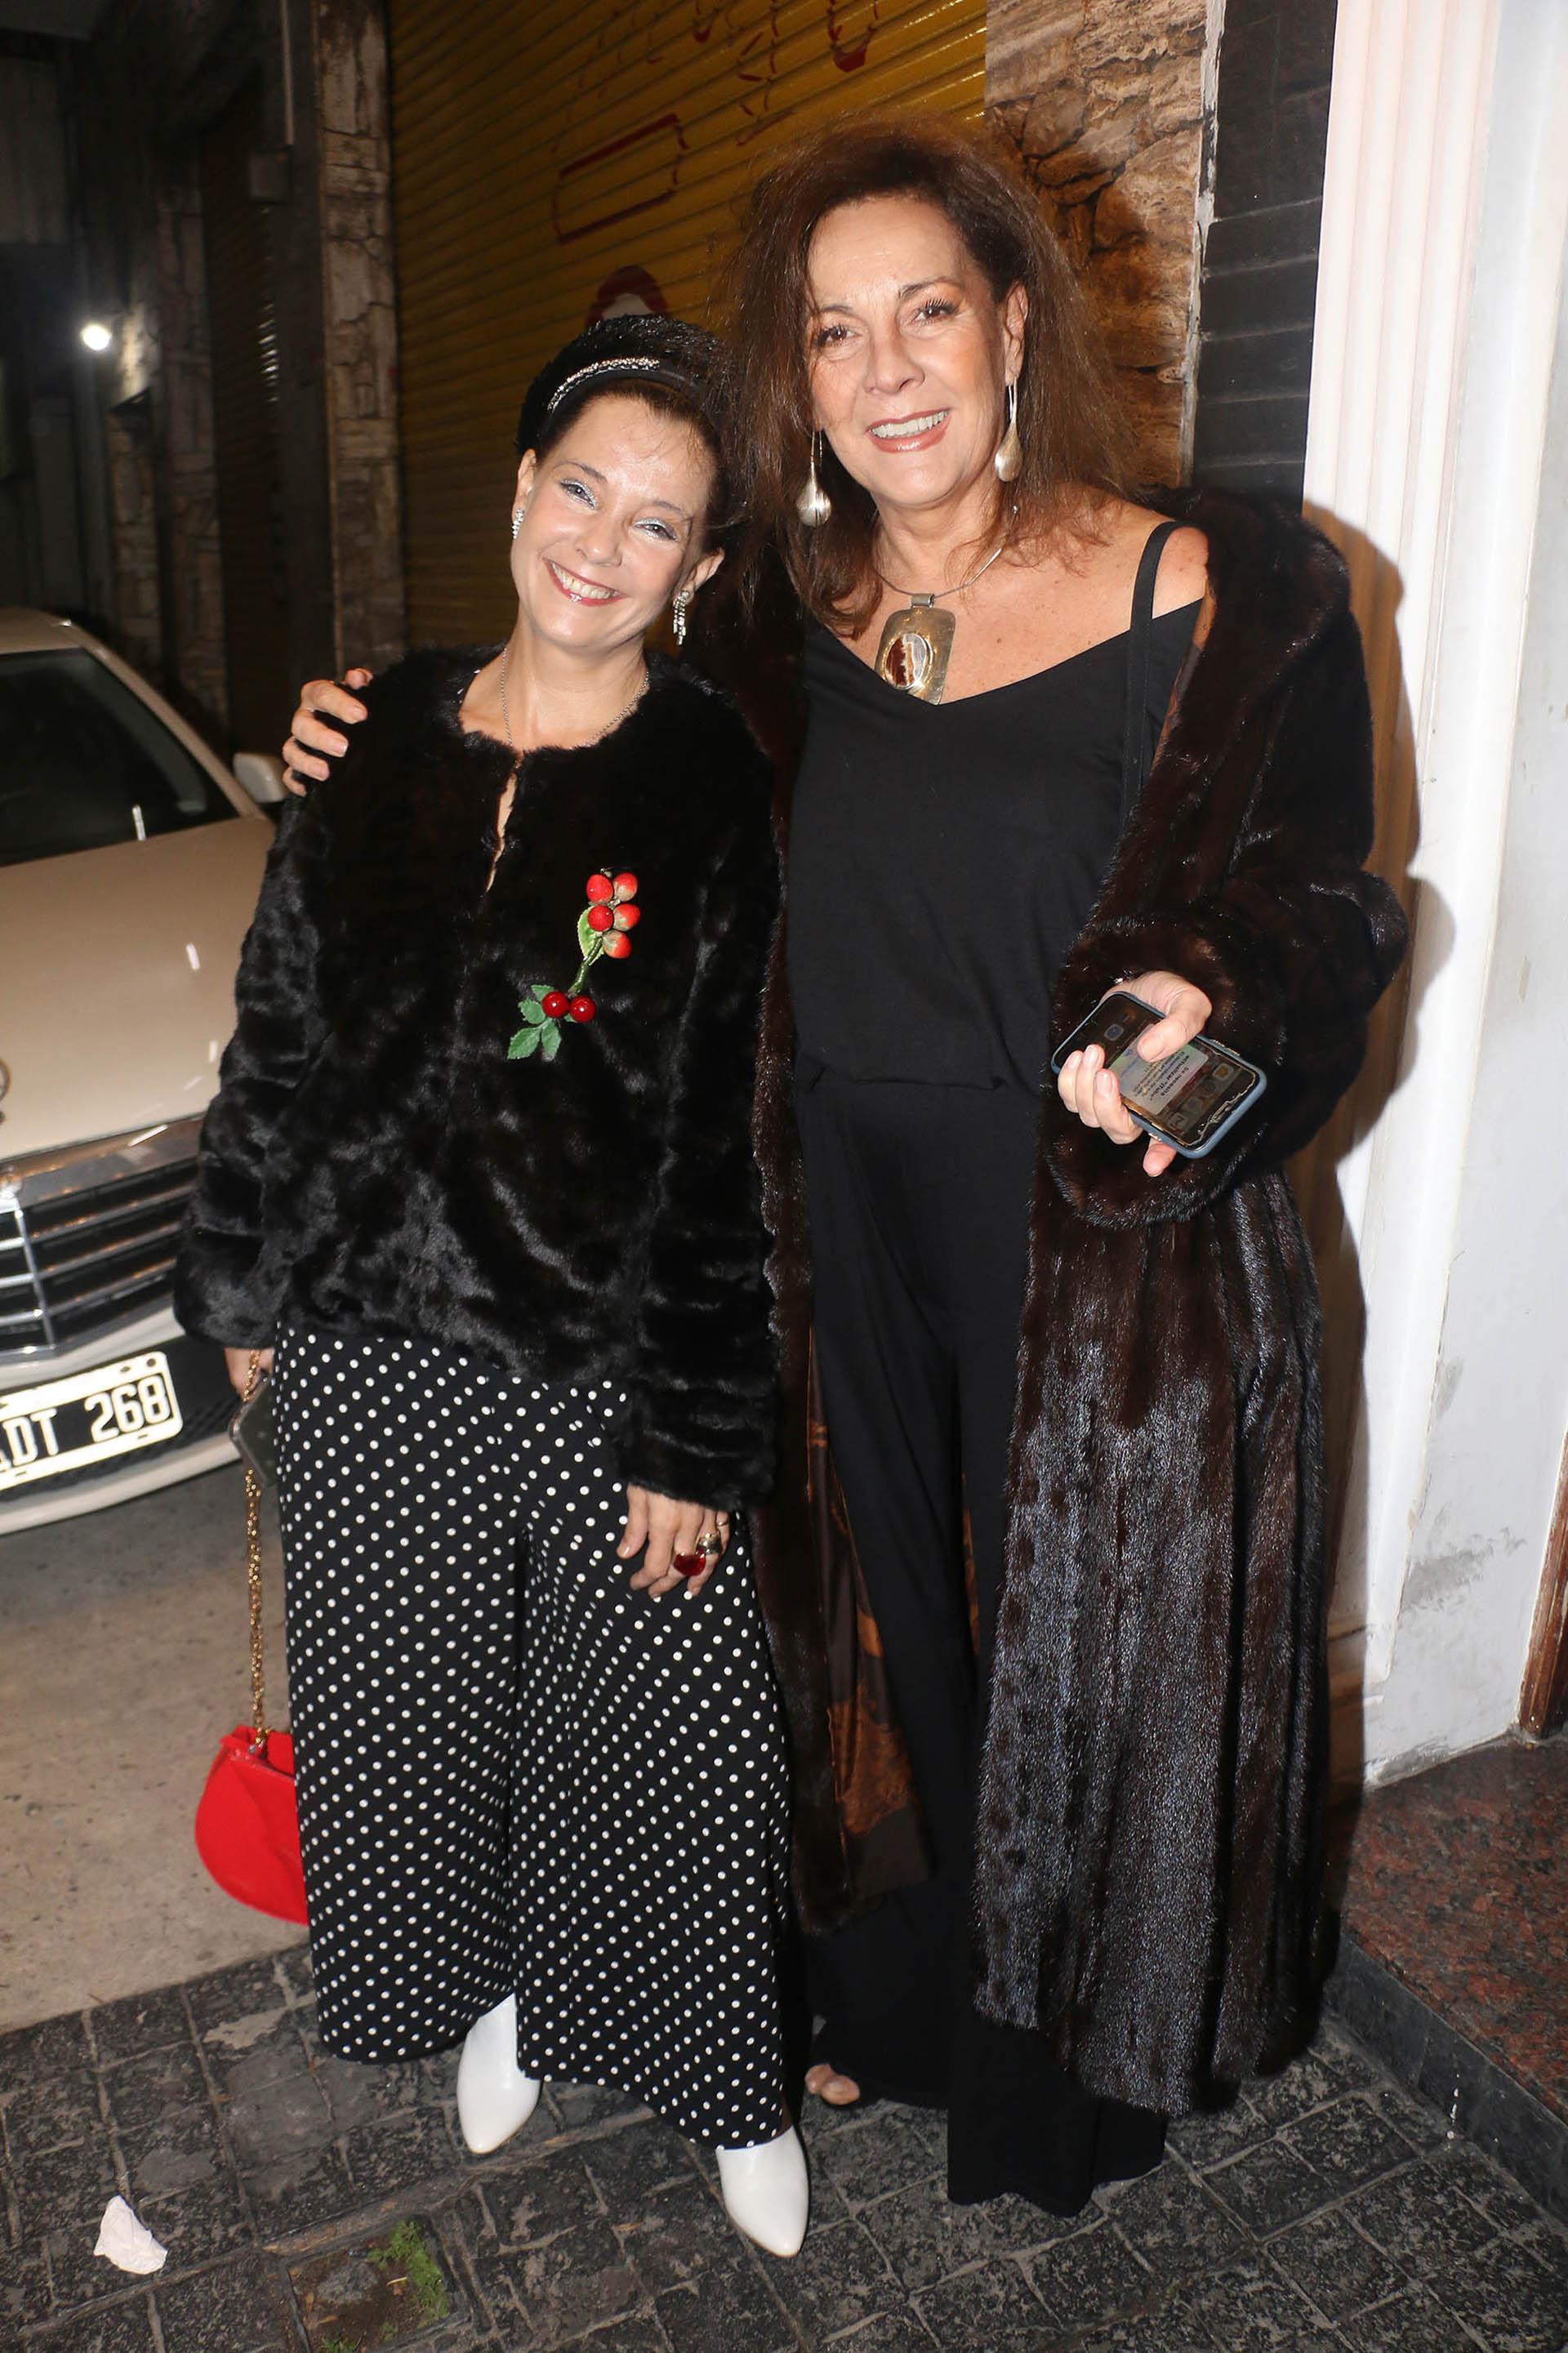 Mónica Gonzaga y Marikena Riera (Verónica Guerman / Teleshow)